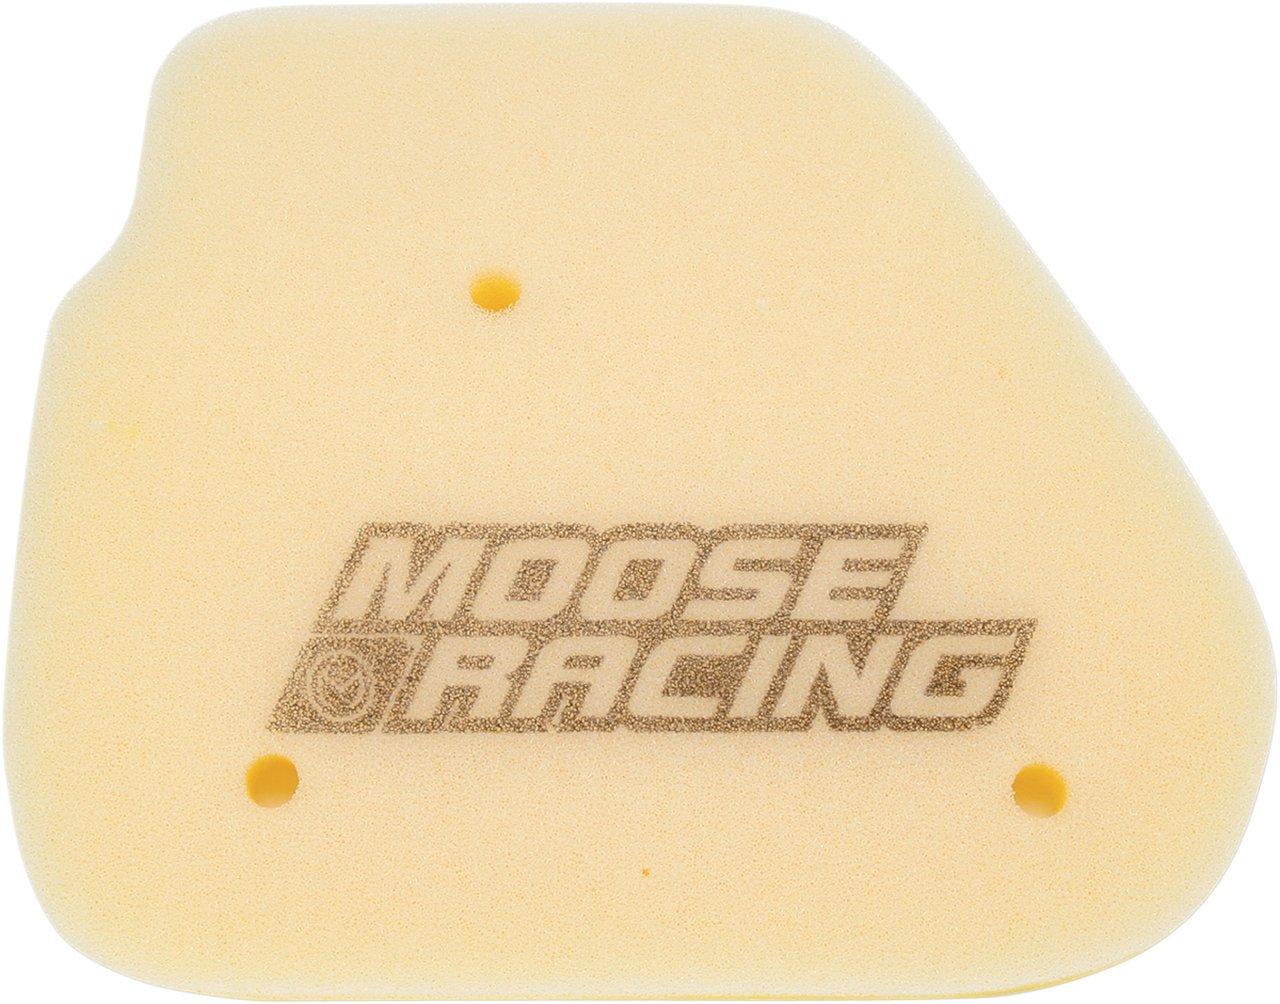 【MOOSE RACING】PPO (PRECISION PRE-OILED) 空氣濾芯 [1011-1127] - 「Webike-摩托百貨」